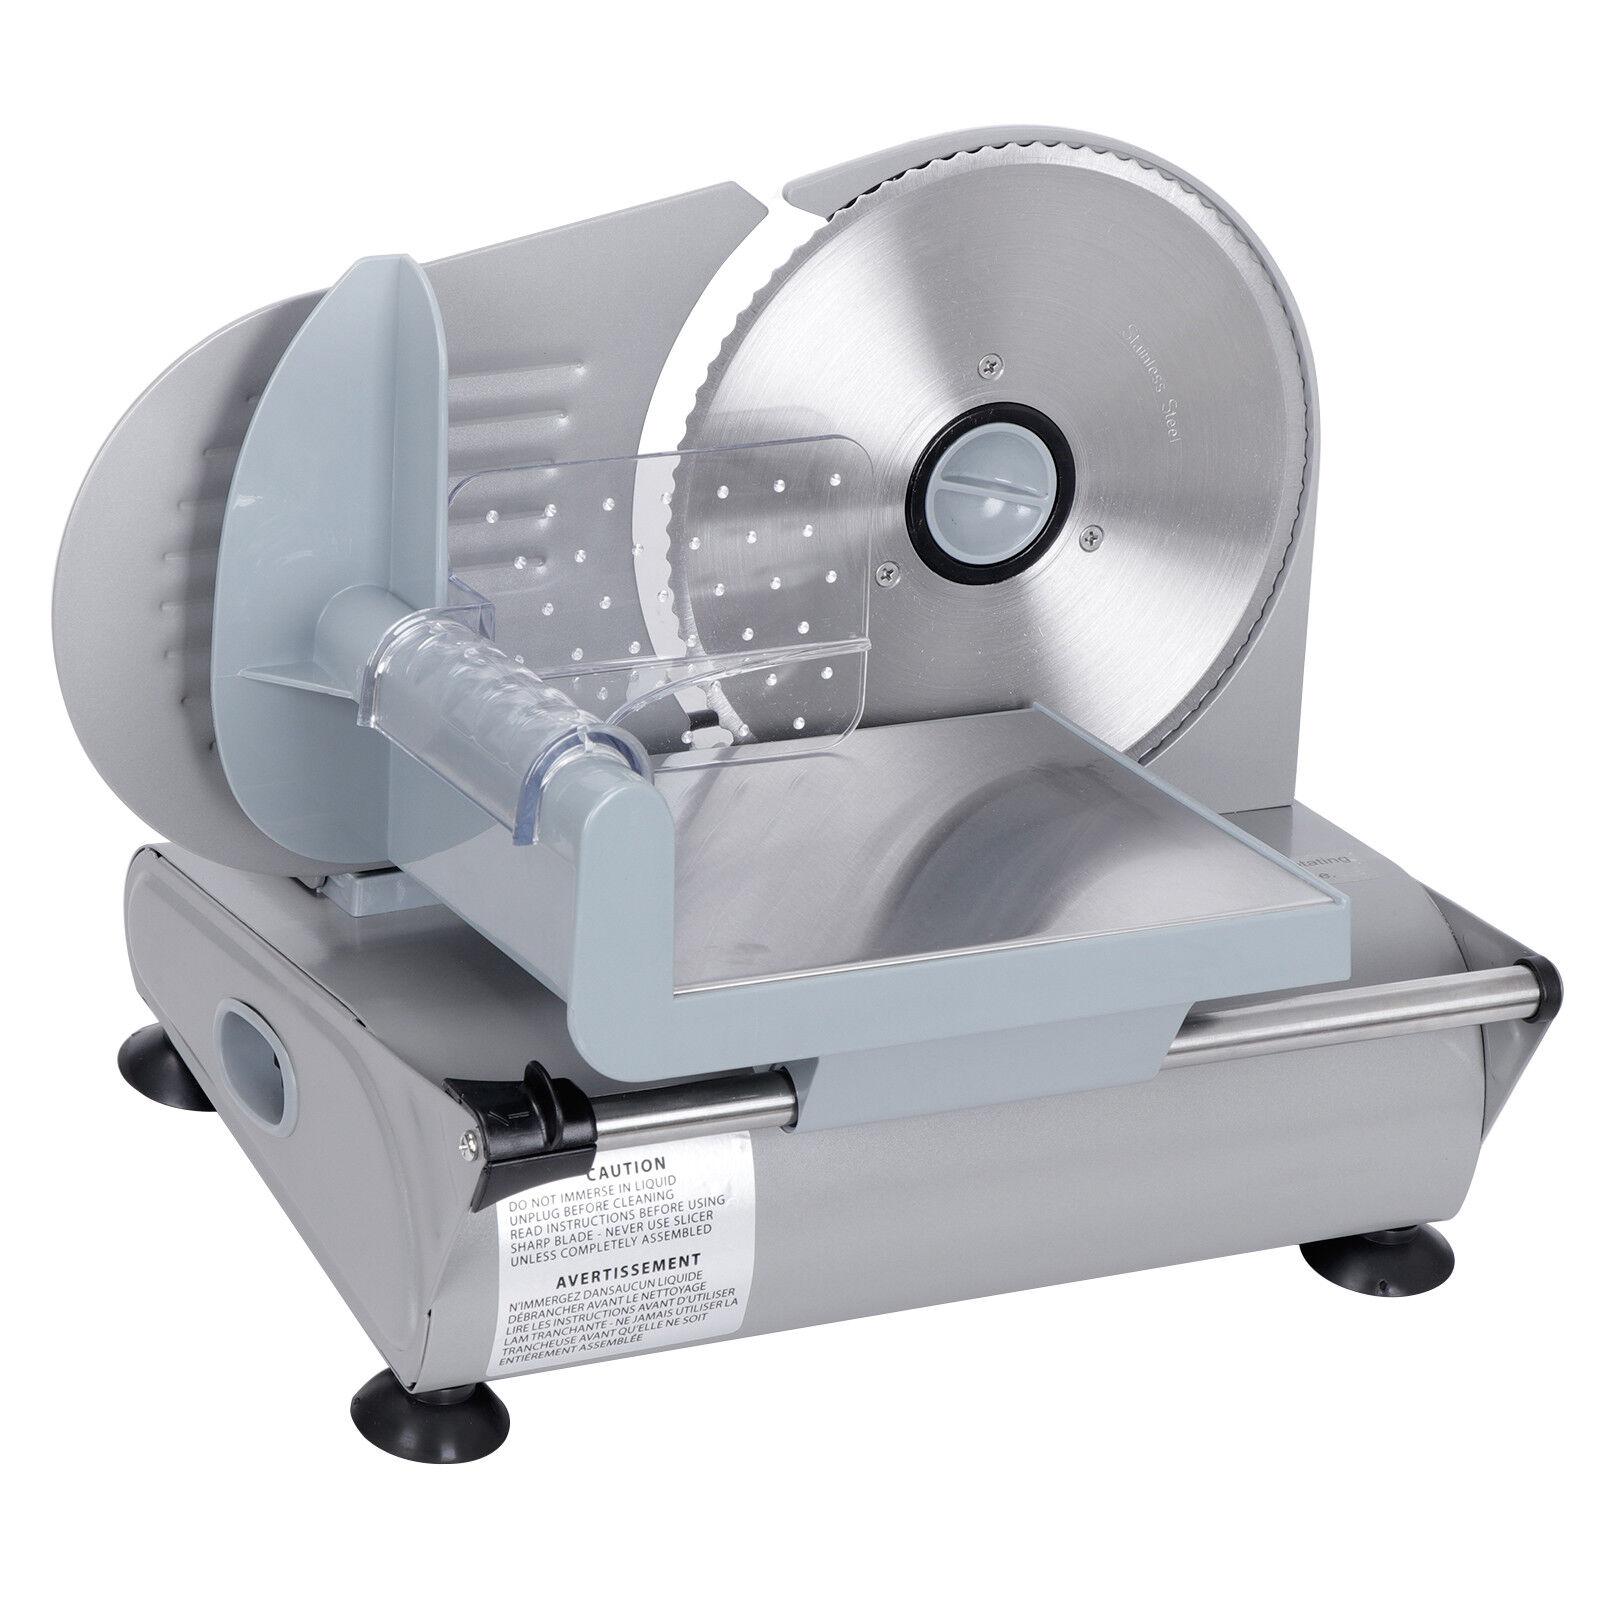 NEW 7.5″ Electric Meat Slicer Blade Home Deli Food Slicer Veggie Premium Kitchen Business & Industrial